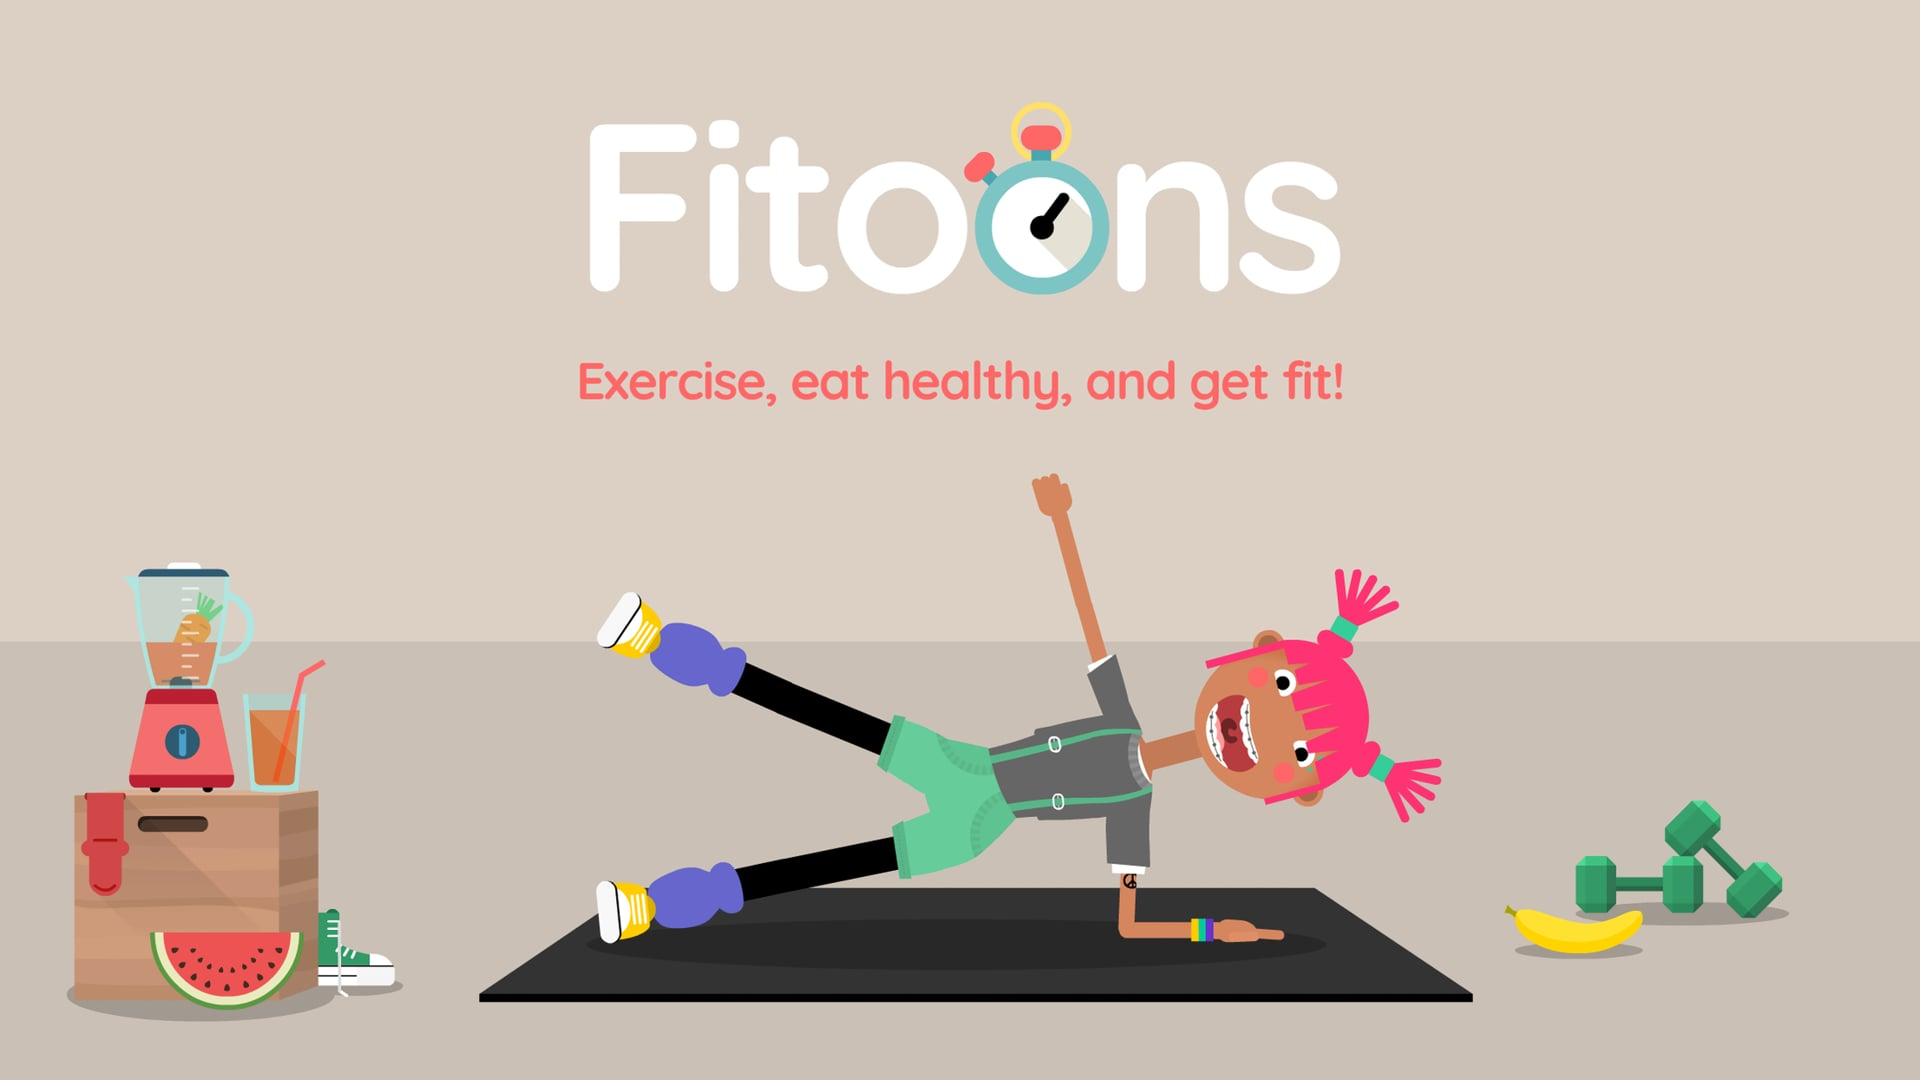 Fitoons by Avokiddo - iOS trailer